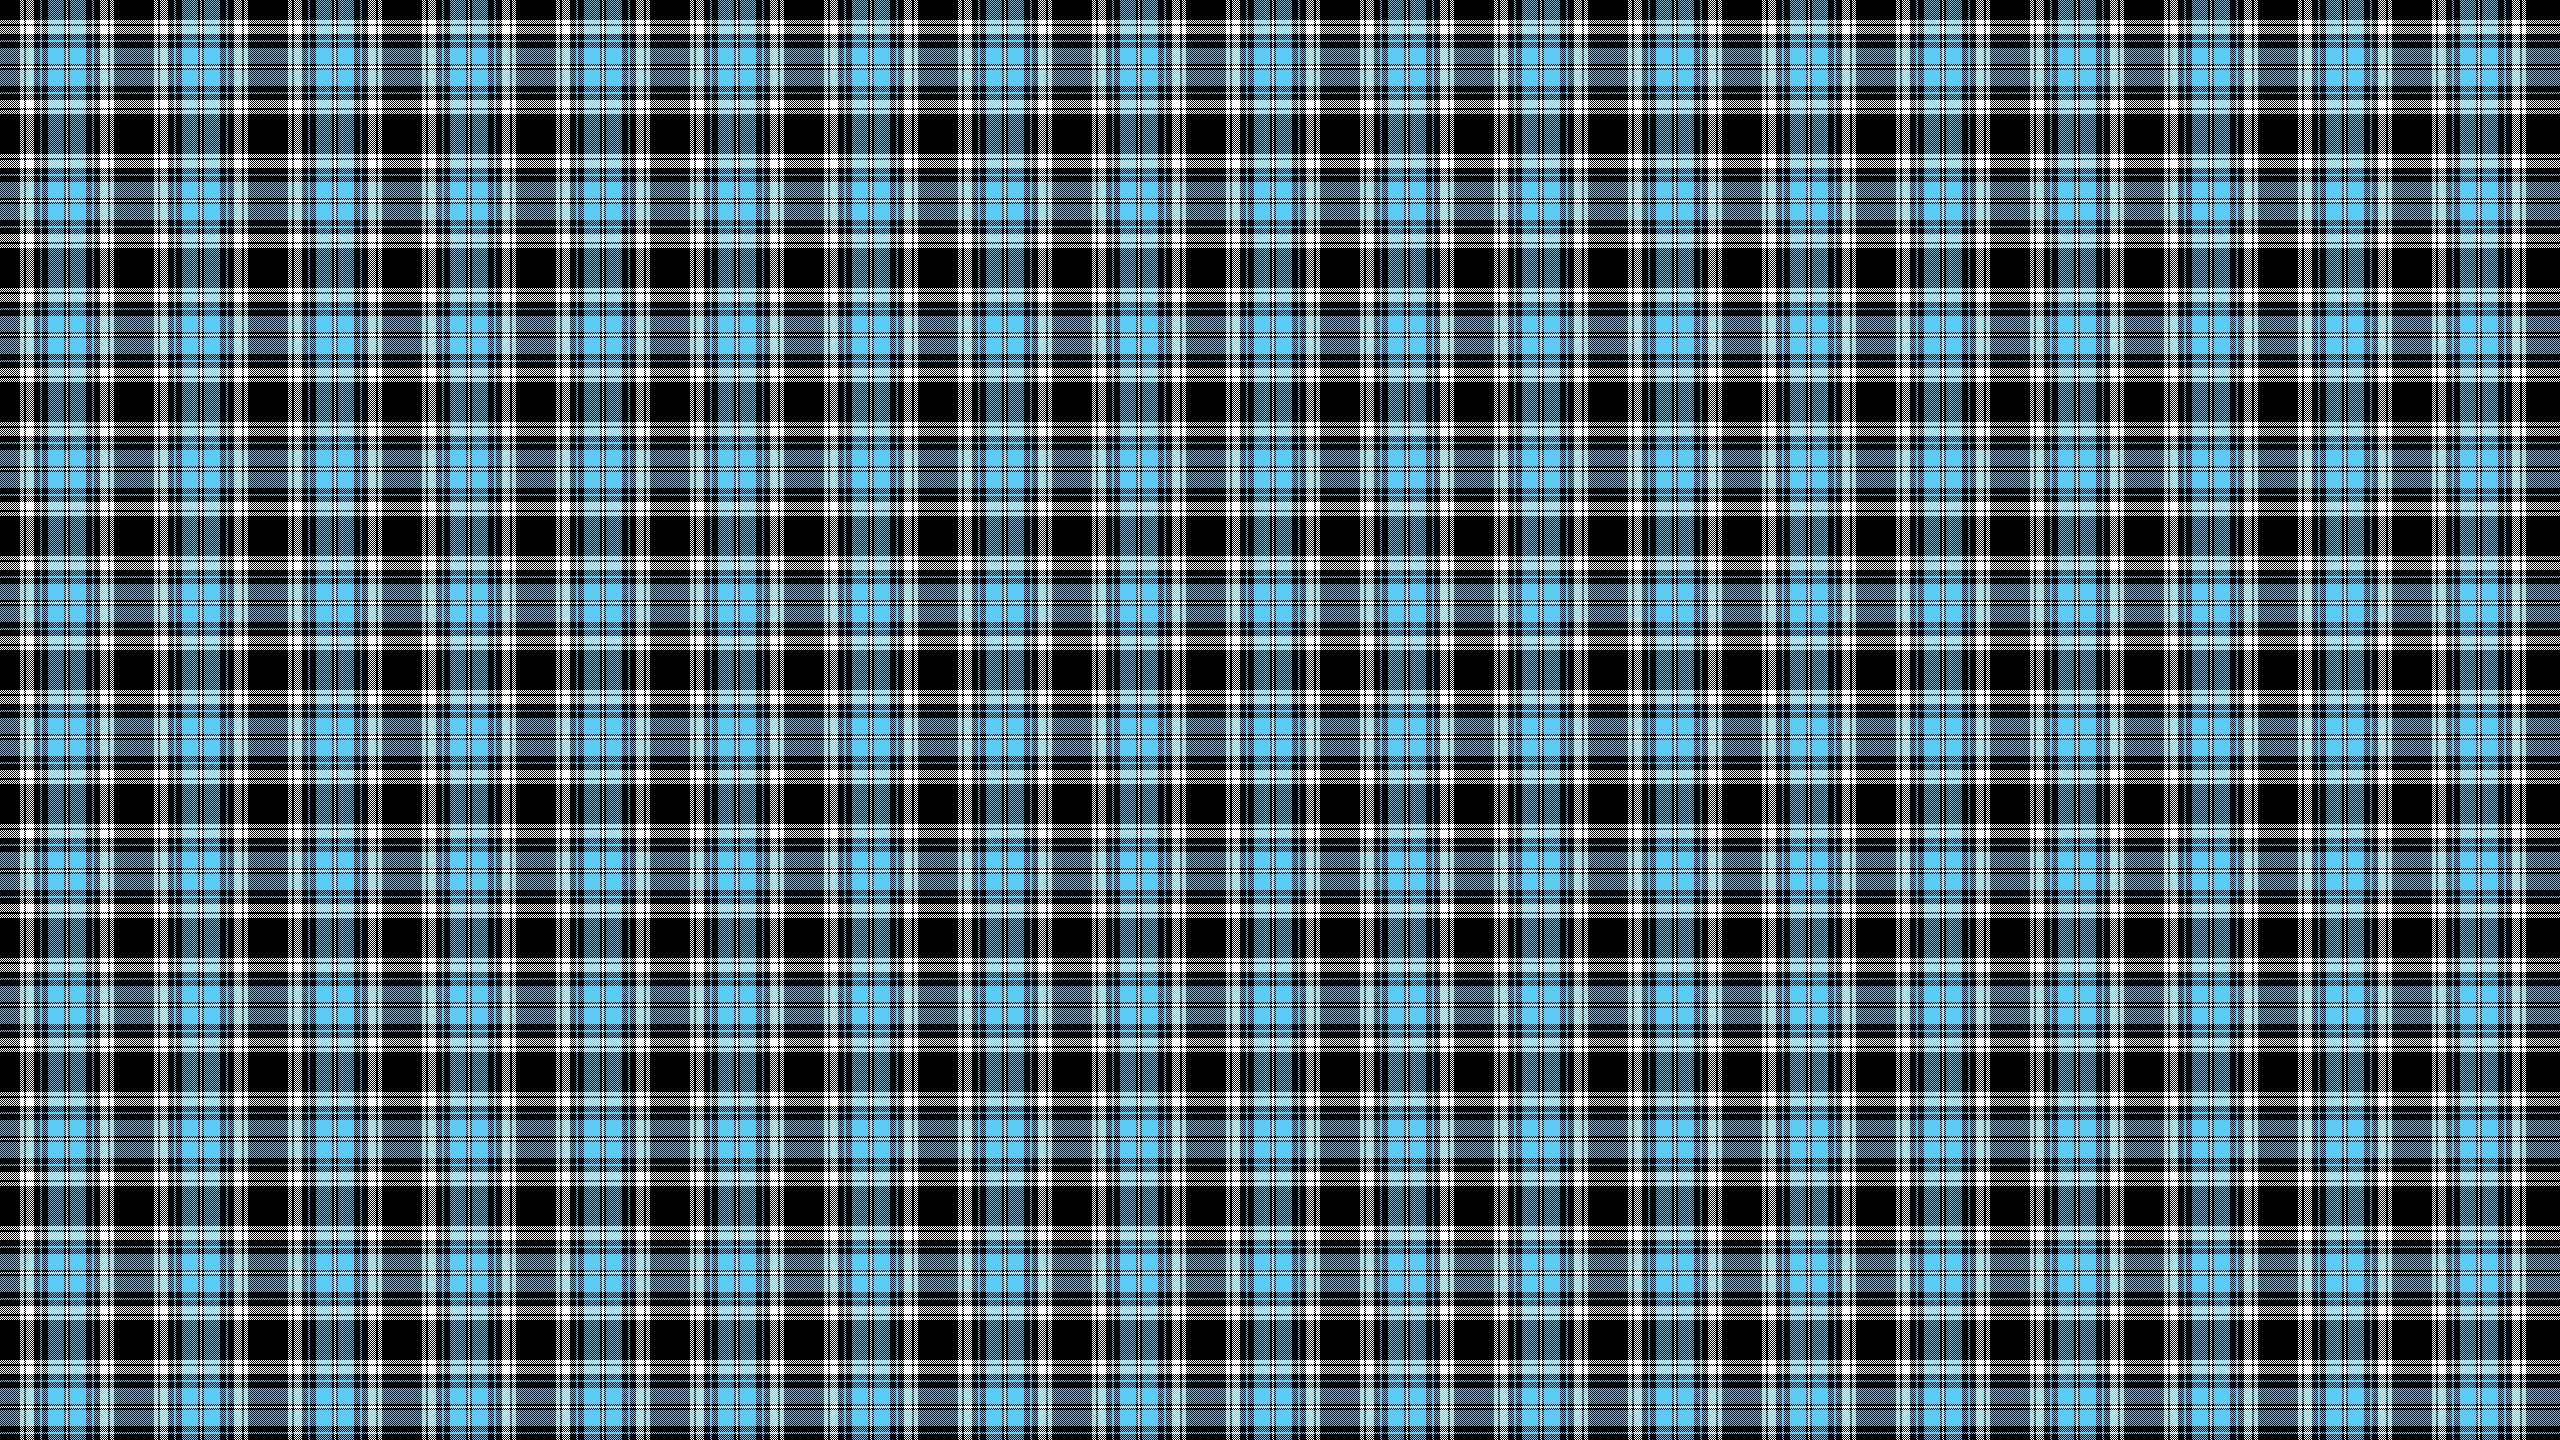 Blue Plaid Desktop Wallpaper  | Plaids | Pinterest | Desktop